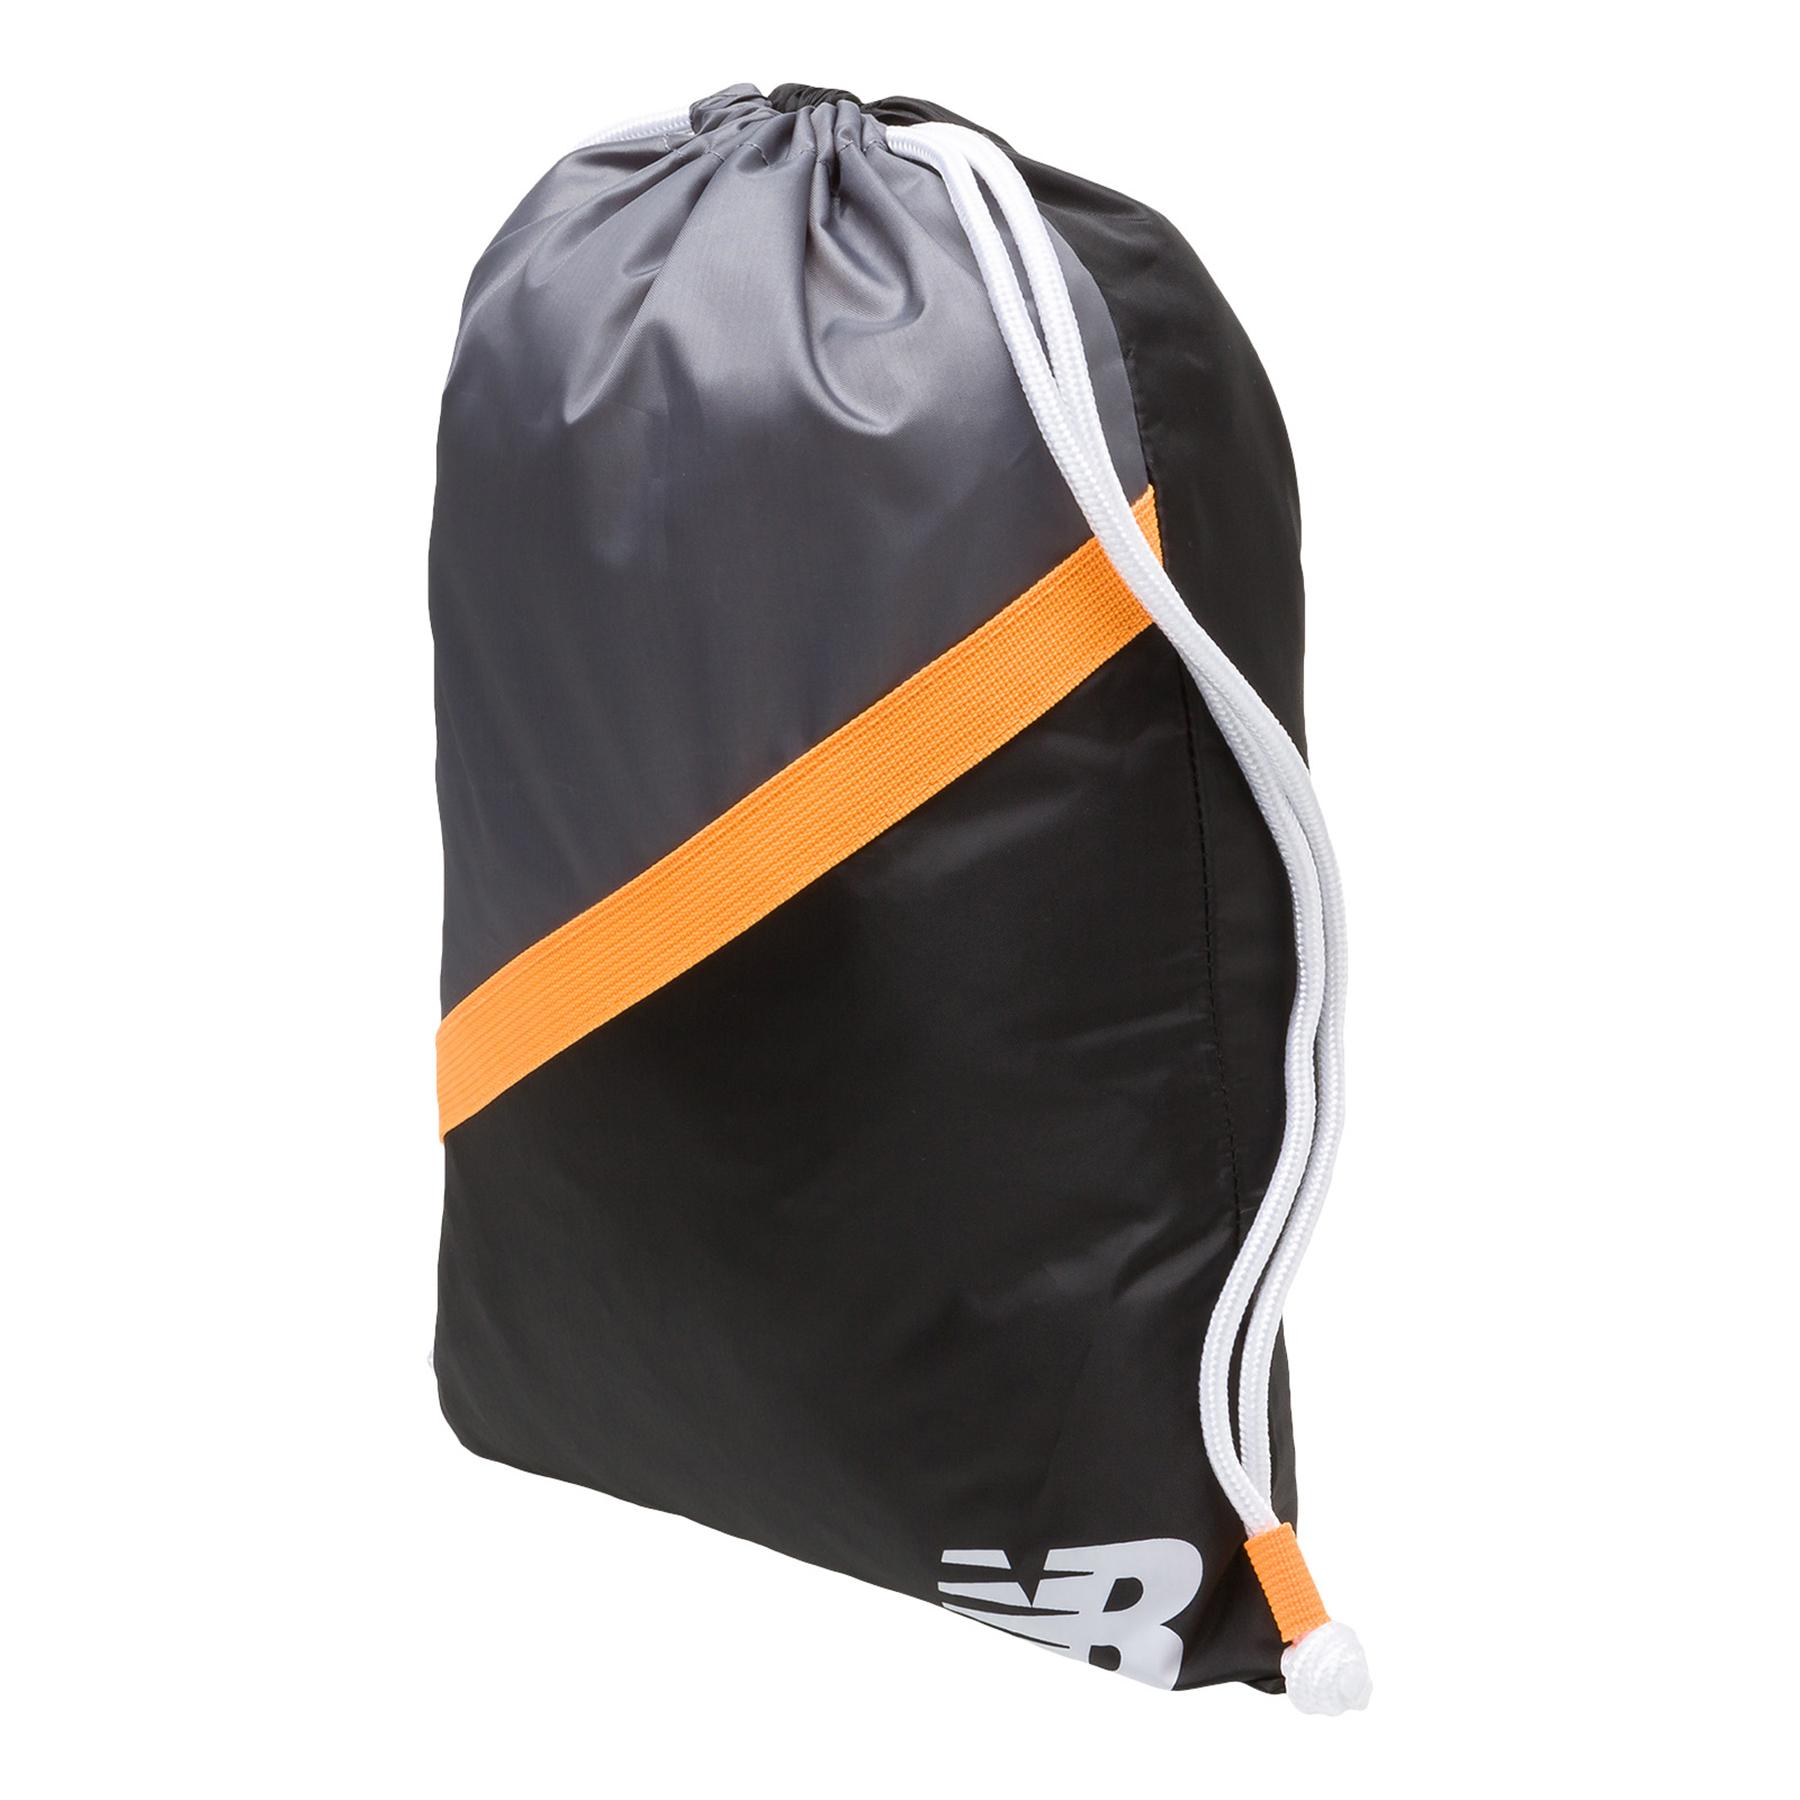 New Balance Team Gym Bag Black